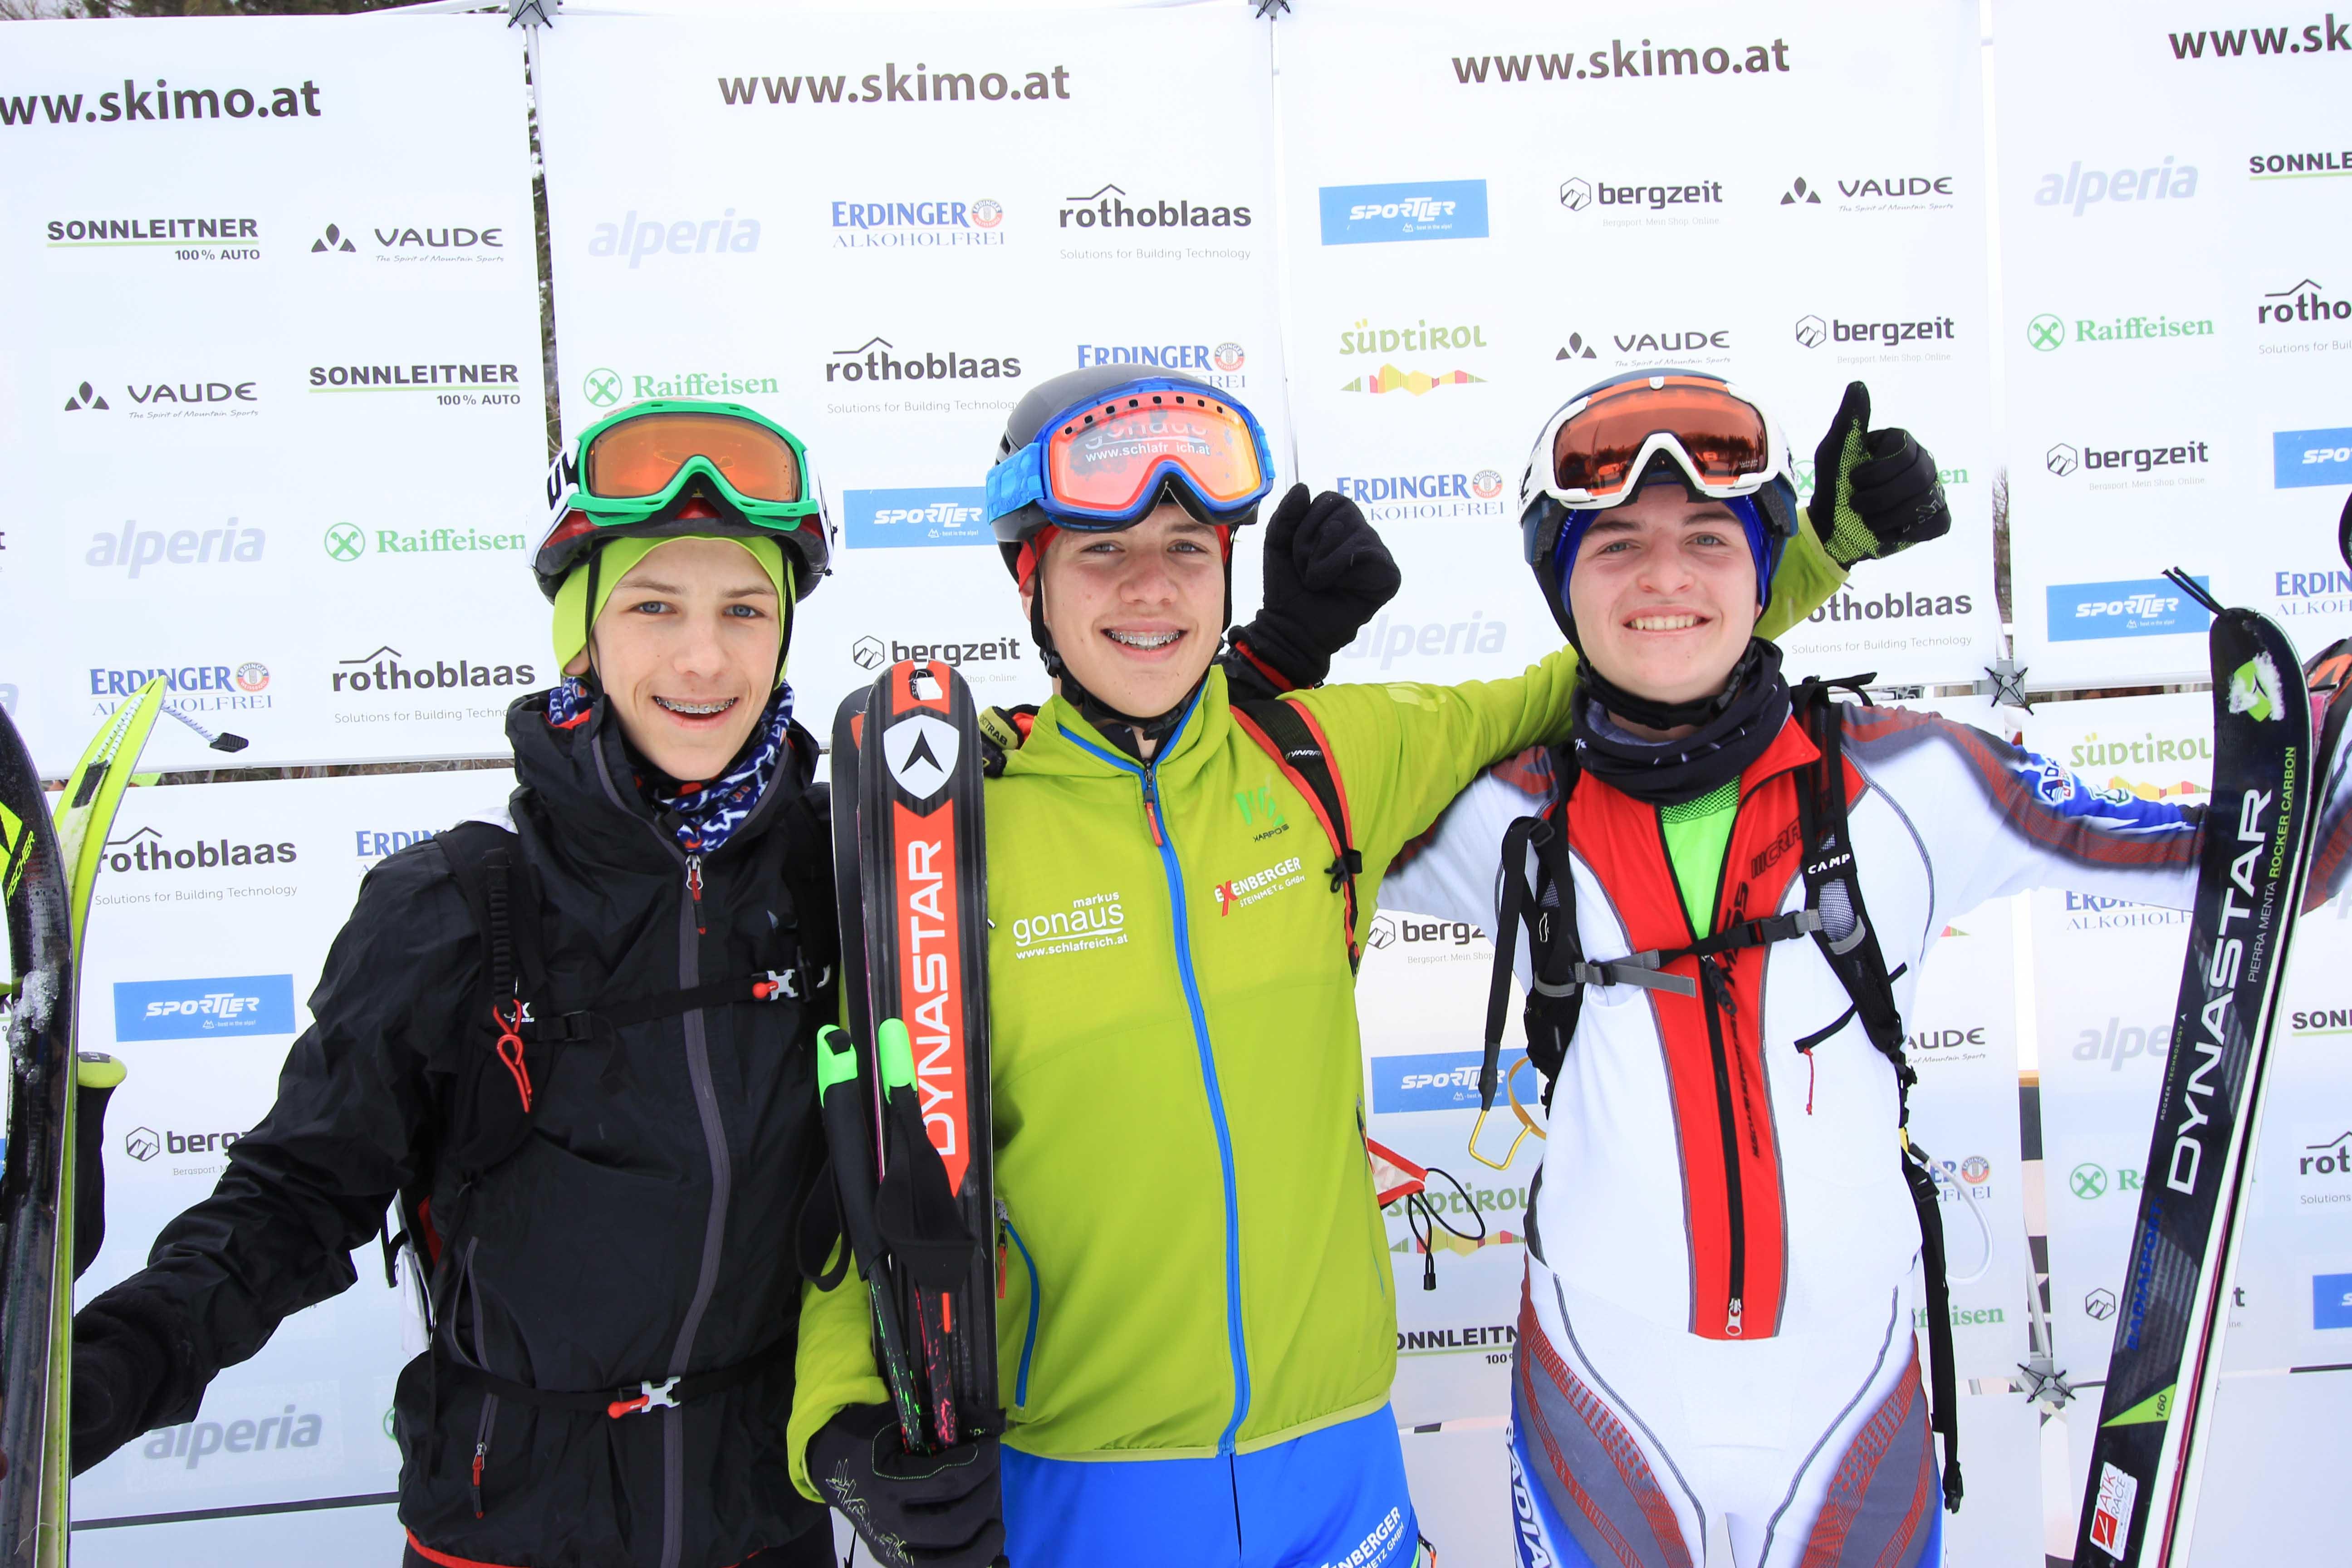 Marmotta Trophy 2018_Individual_Motiv5_Bild Karl Posch_LR